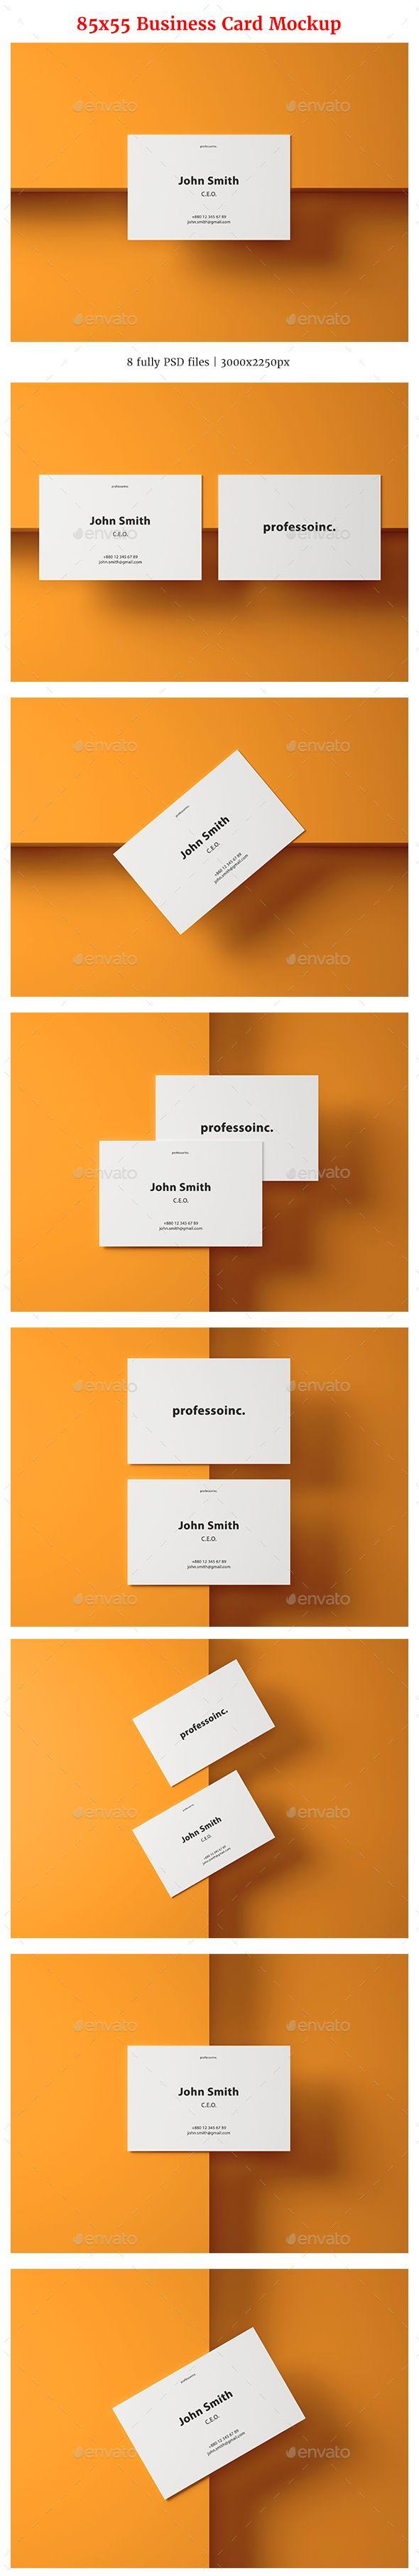 85x55 business card mockup set 2 pinterest reheart Choice Image